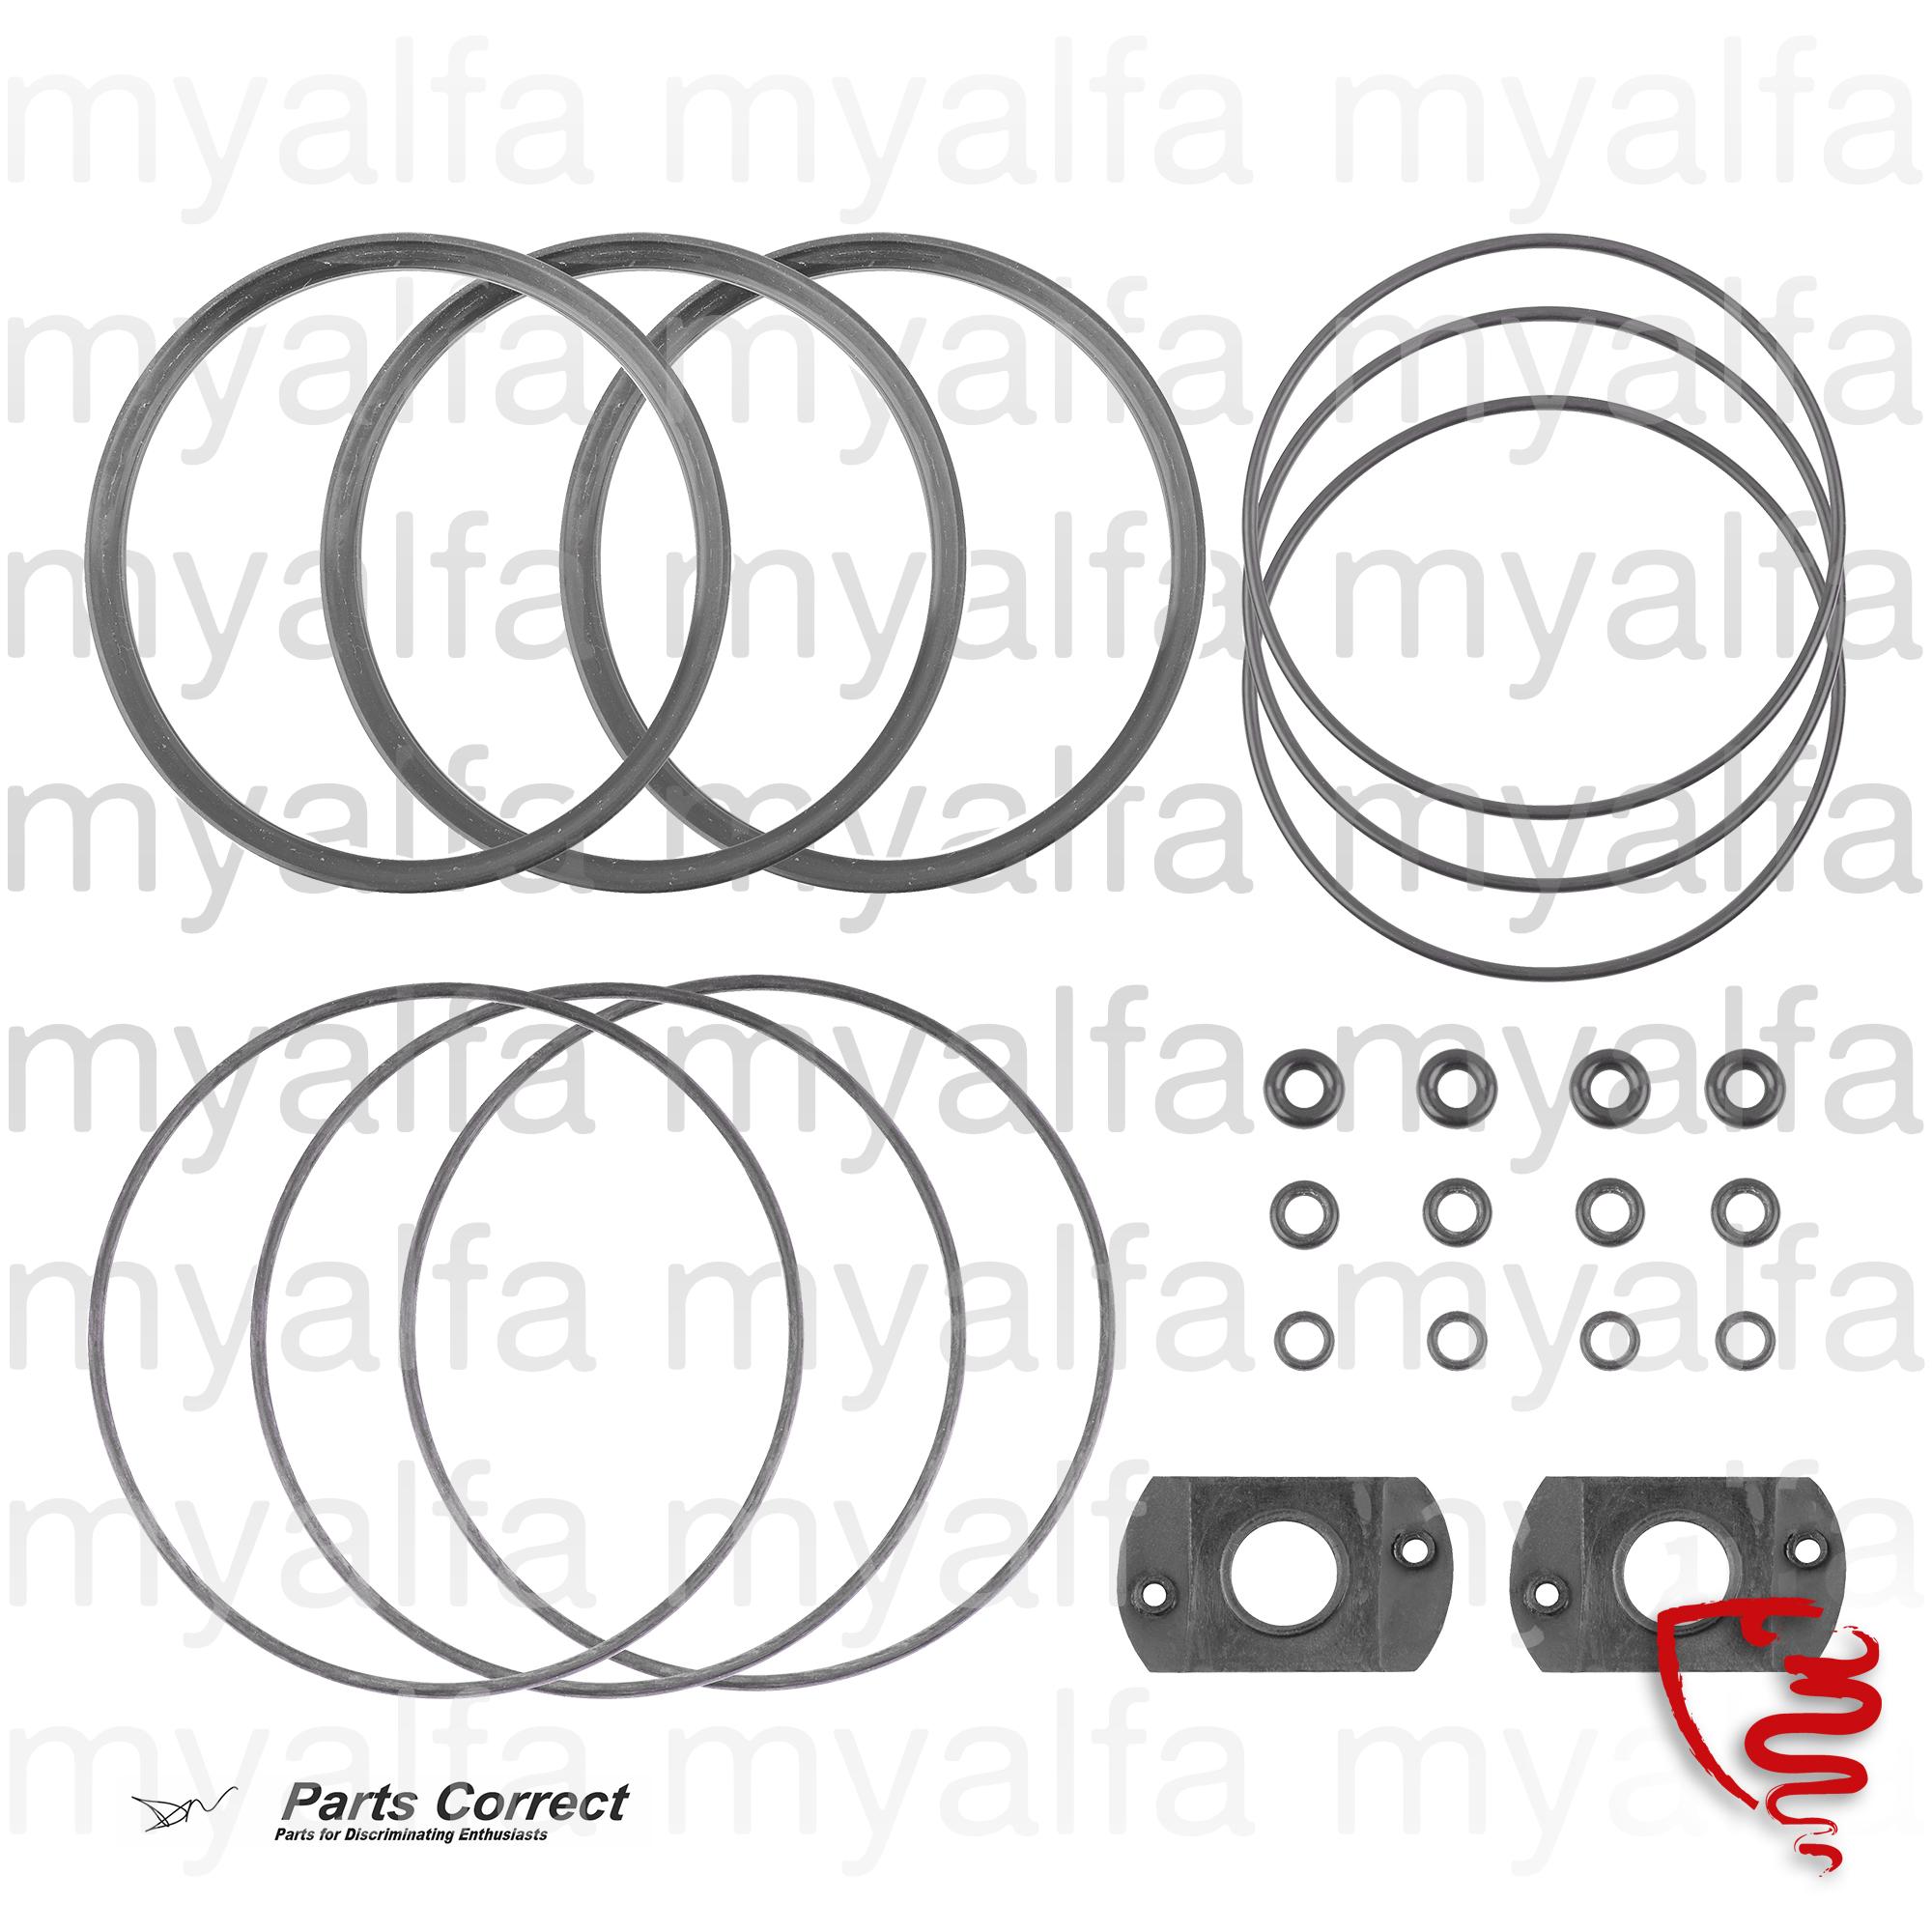 Conj. gauges seals 750/101 for 750/101, Interior, Dashboard, Instruments